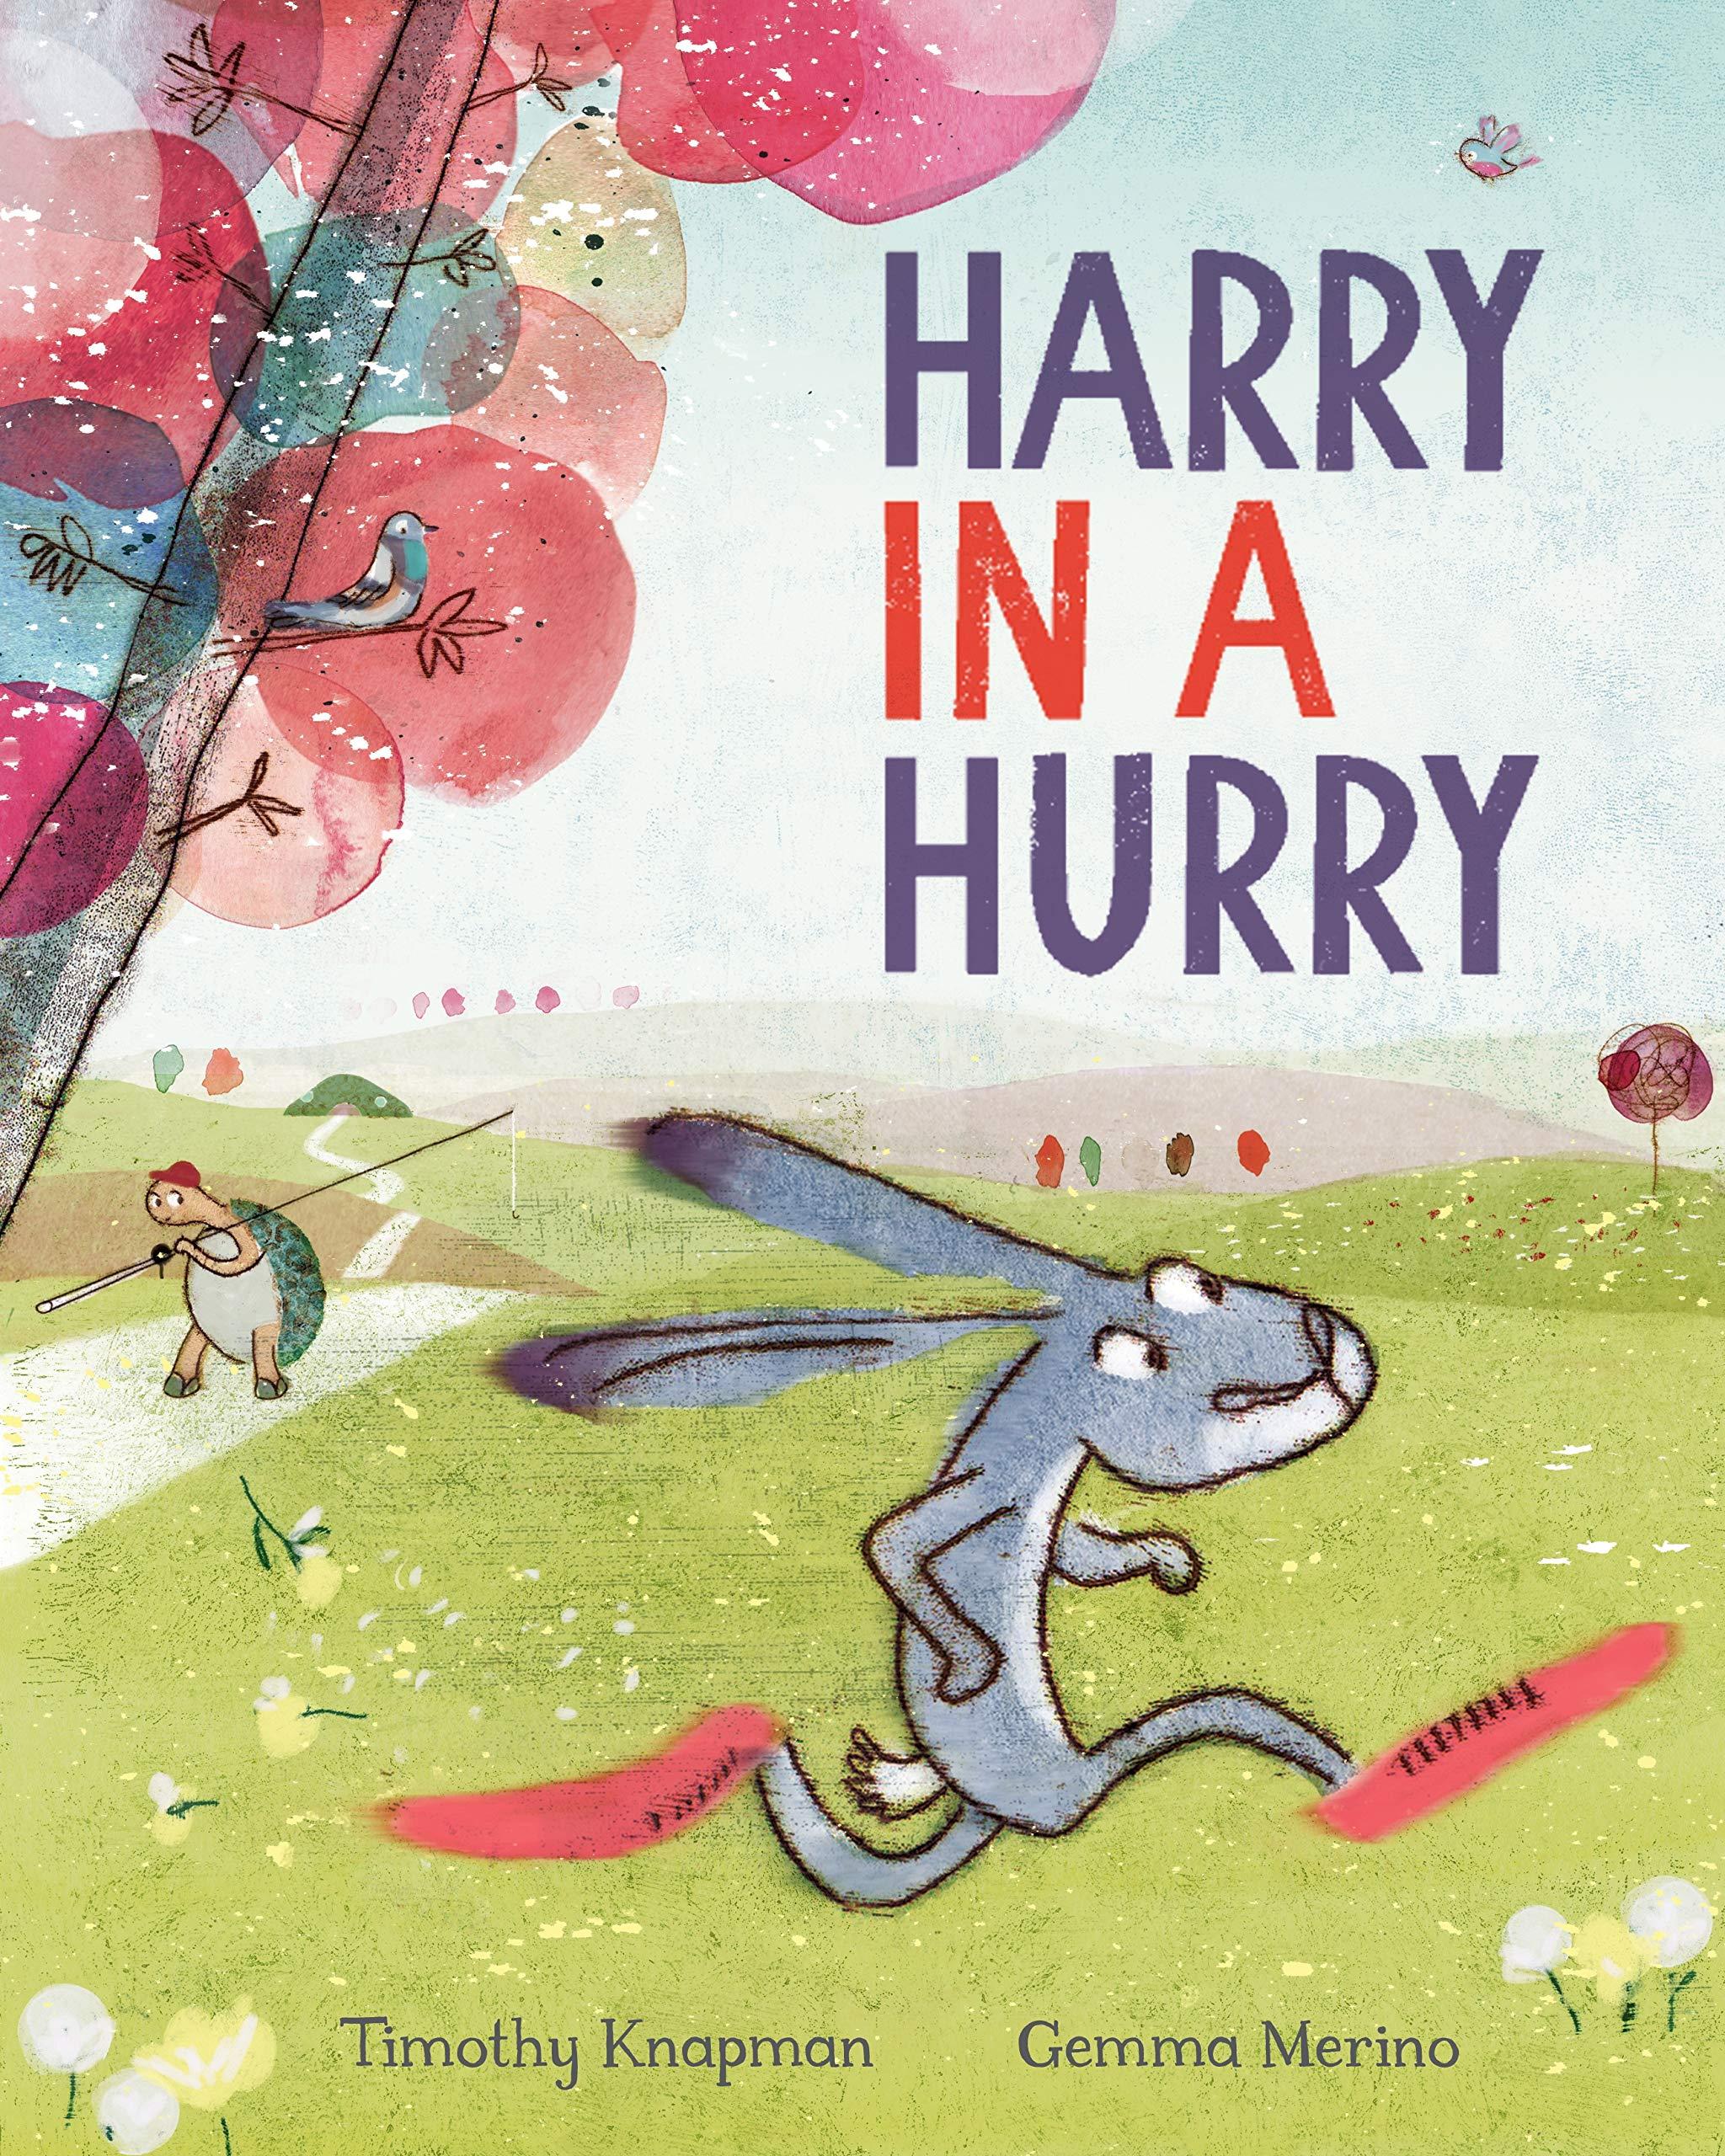 Harry in a Hurry: Amazon.co.uk: Timothy Knapman, Gemma Merino ...